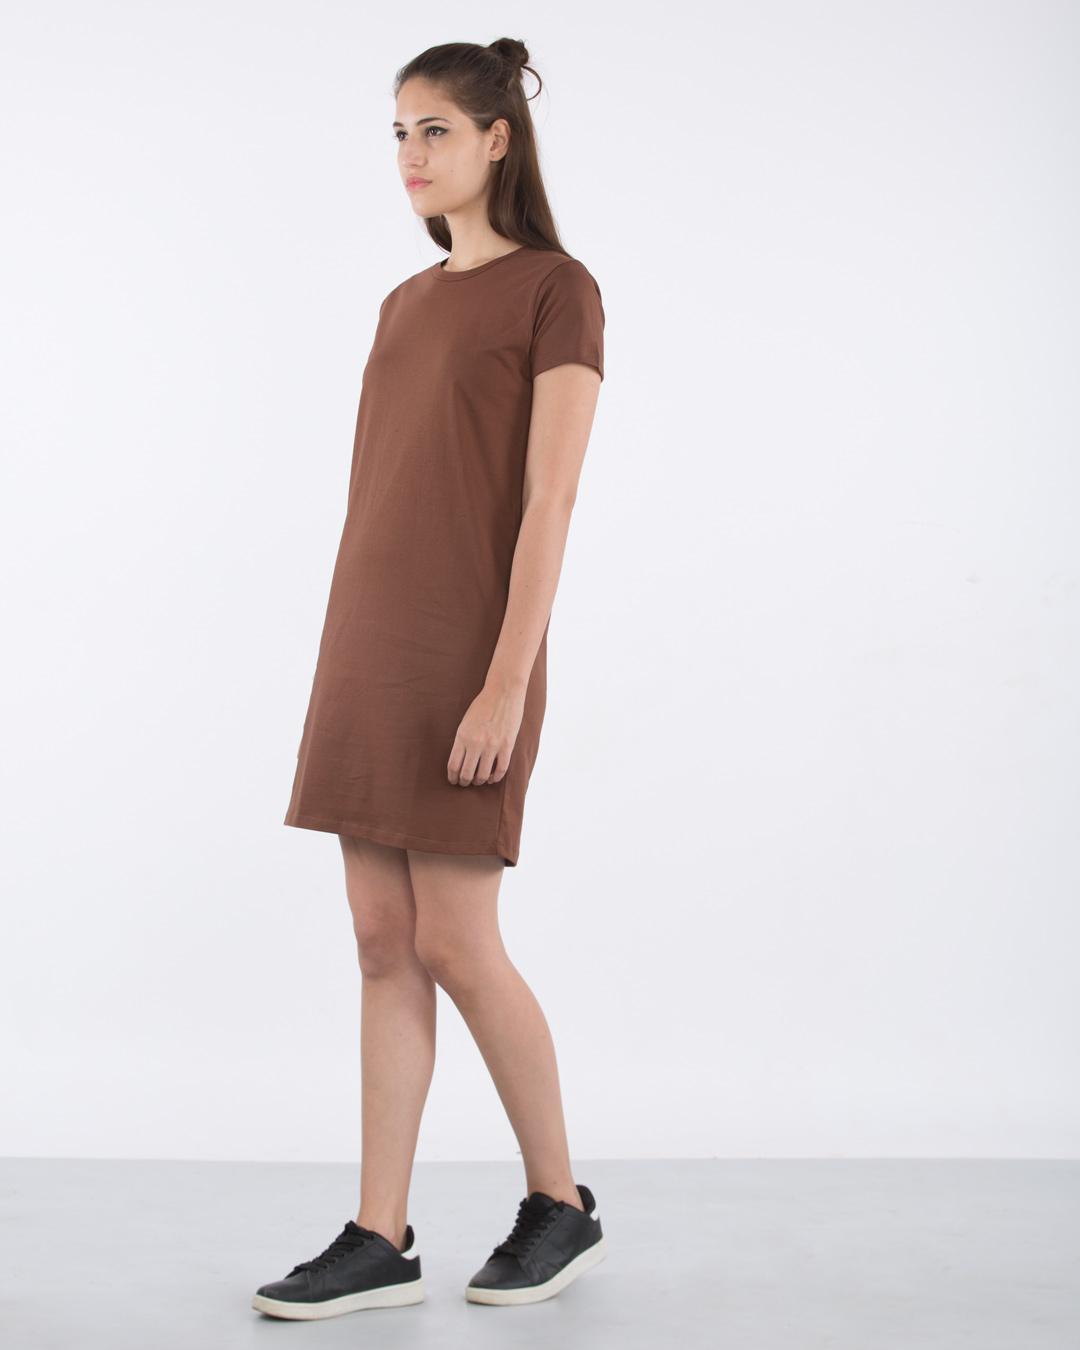 0248f7dd60f9 Mocha Brown Basic T-Shirt Dress - Plain Womens Basic T-Shirt Dress  Best  Price India - Bewakoof.com